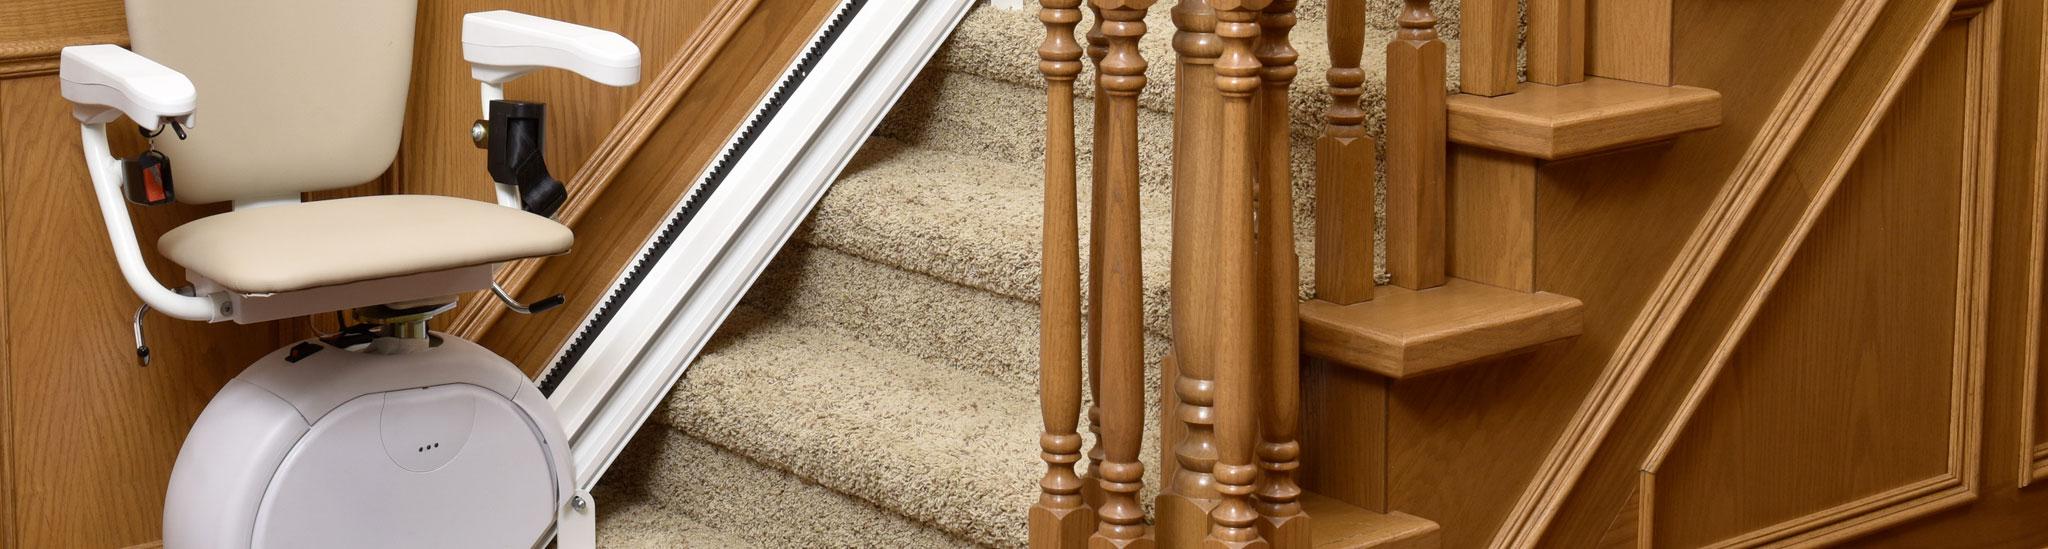 monte escalier bourgogne